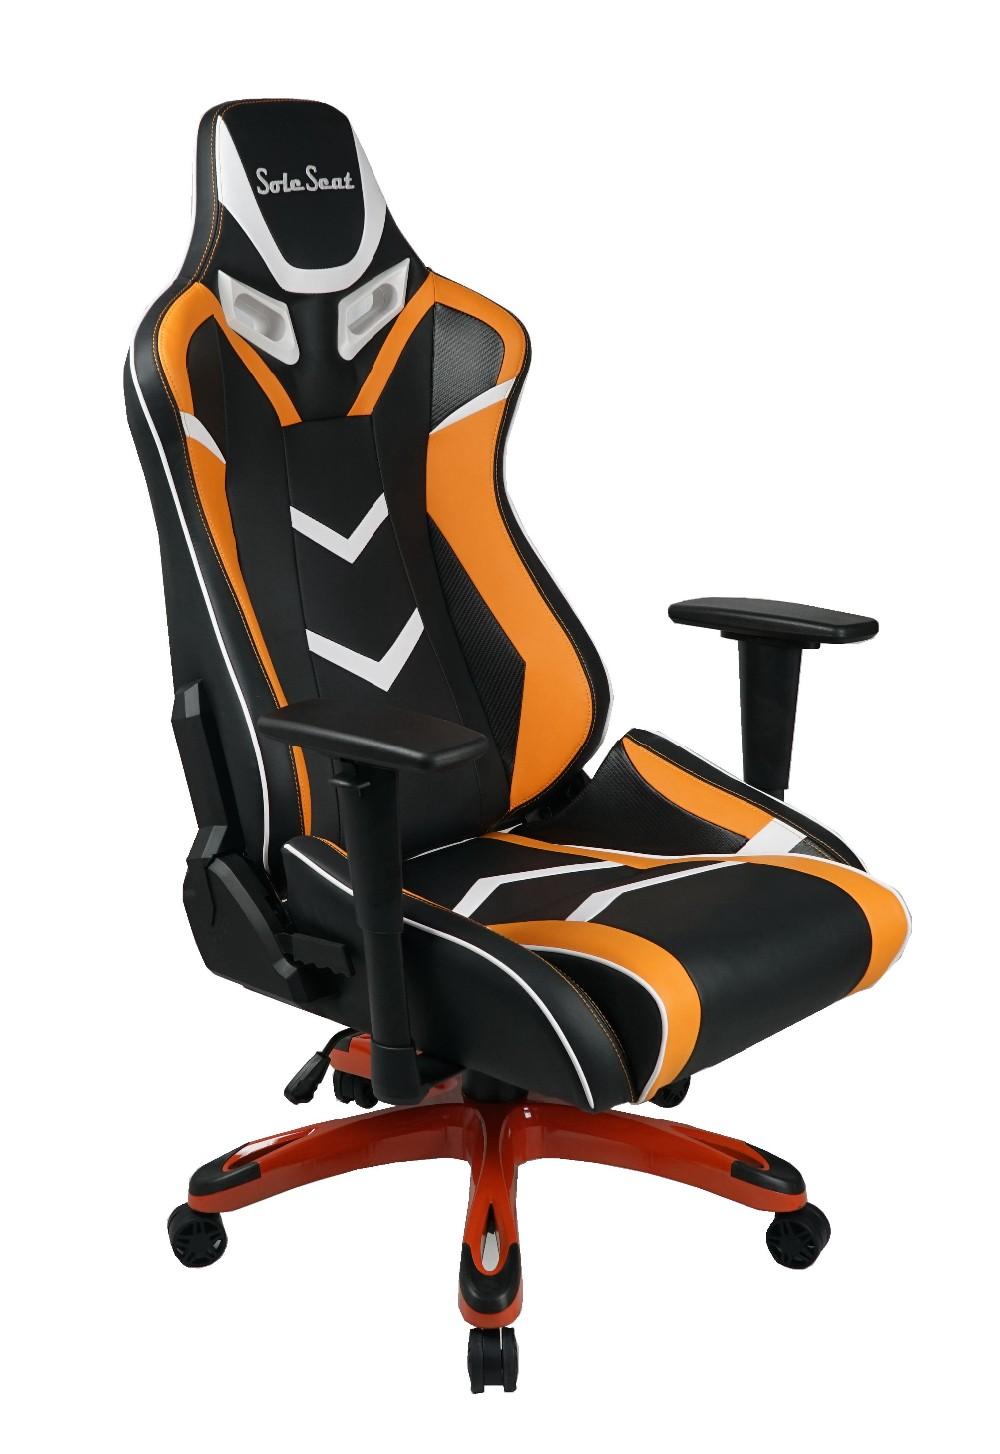 Bumblebee Swivel Design Ergonomic Racing Gaming Chair  : HTB1IejwLXXXXXb7aXXXq6xXFXXXt <strong>Beach</strong> Chair Pillow from www.alibaba.com size 1000 x 1454 jpeg 186kB